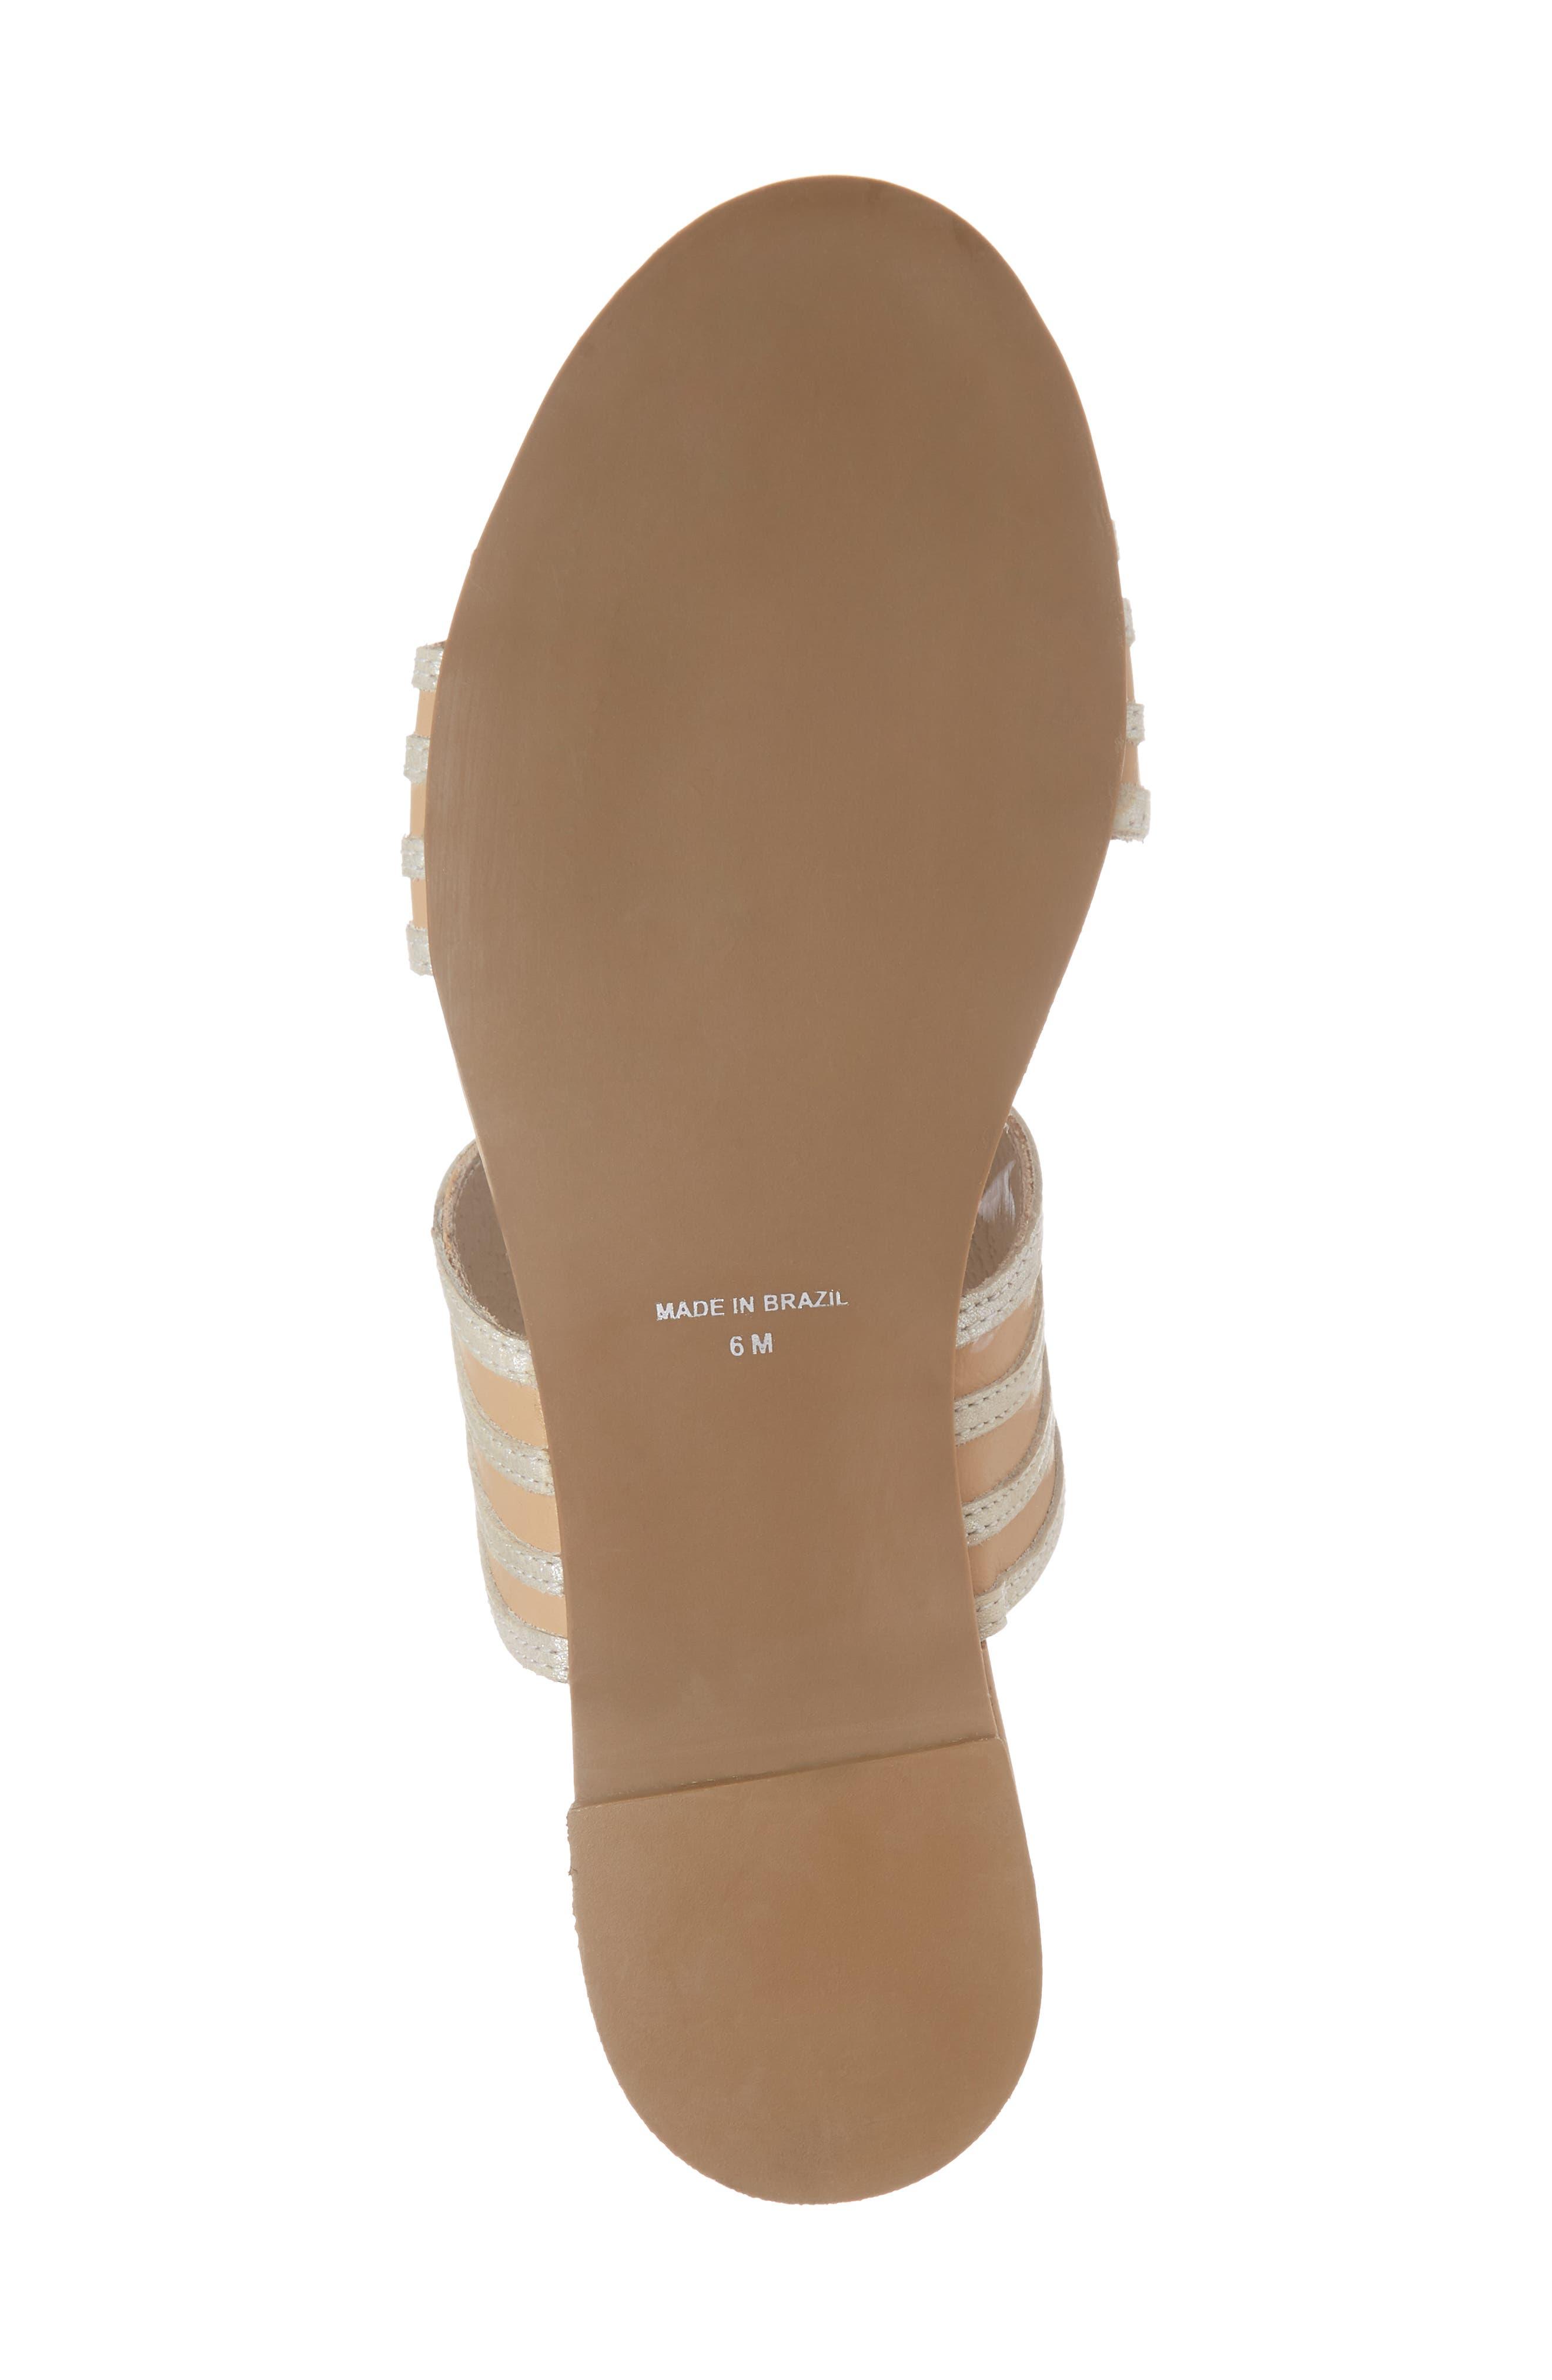 Russo Slide Sandal,                             Alternate thumbnail 6, color,                             Natural/ Silver Leather